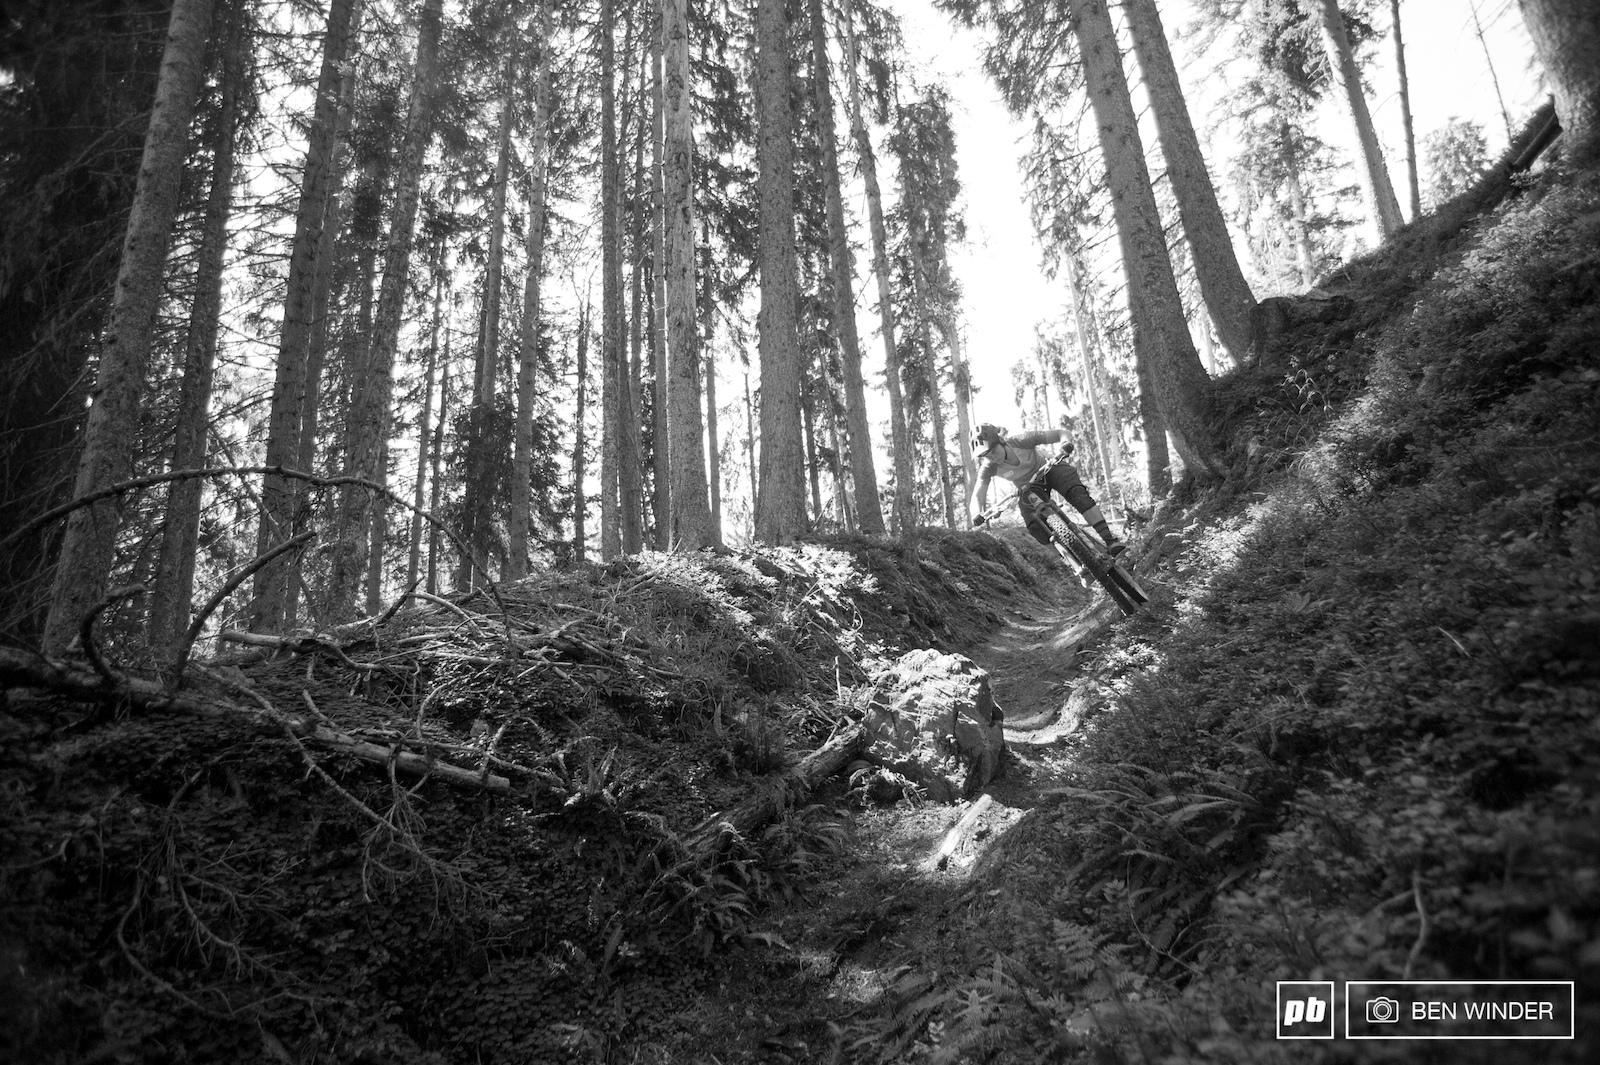 Morgane wall-riding in a fun gulley ride.